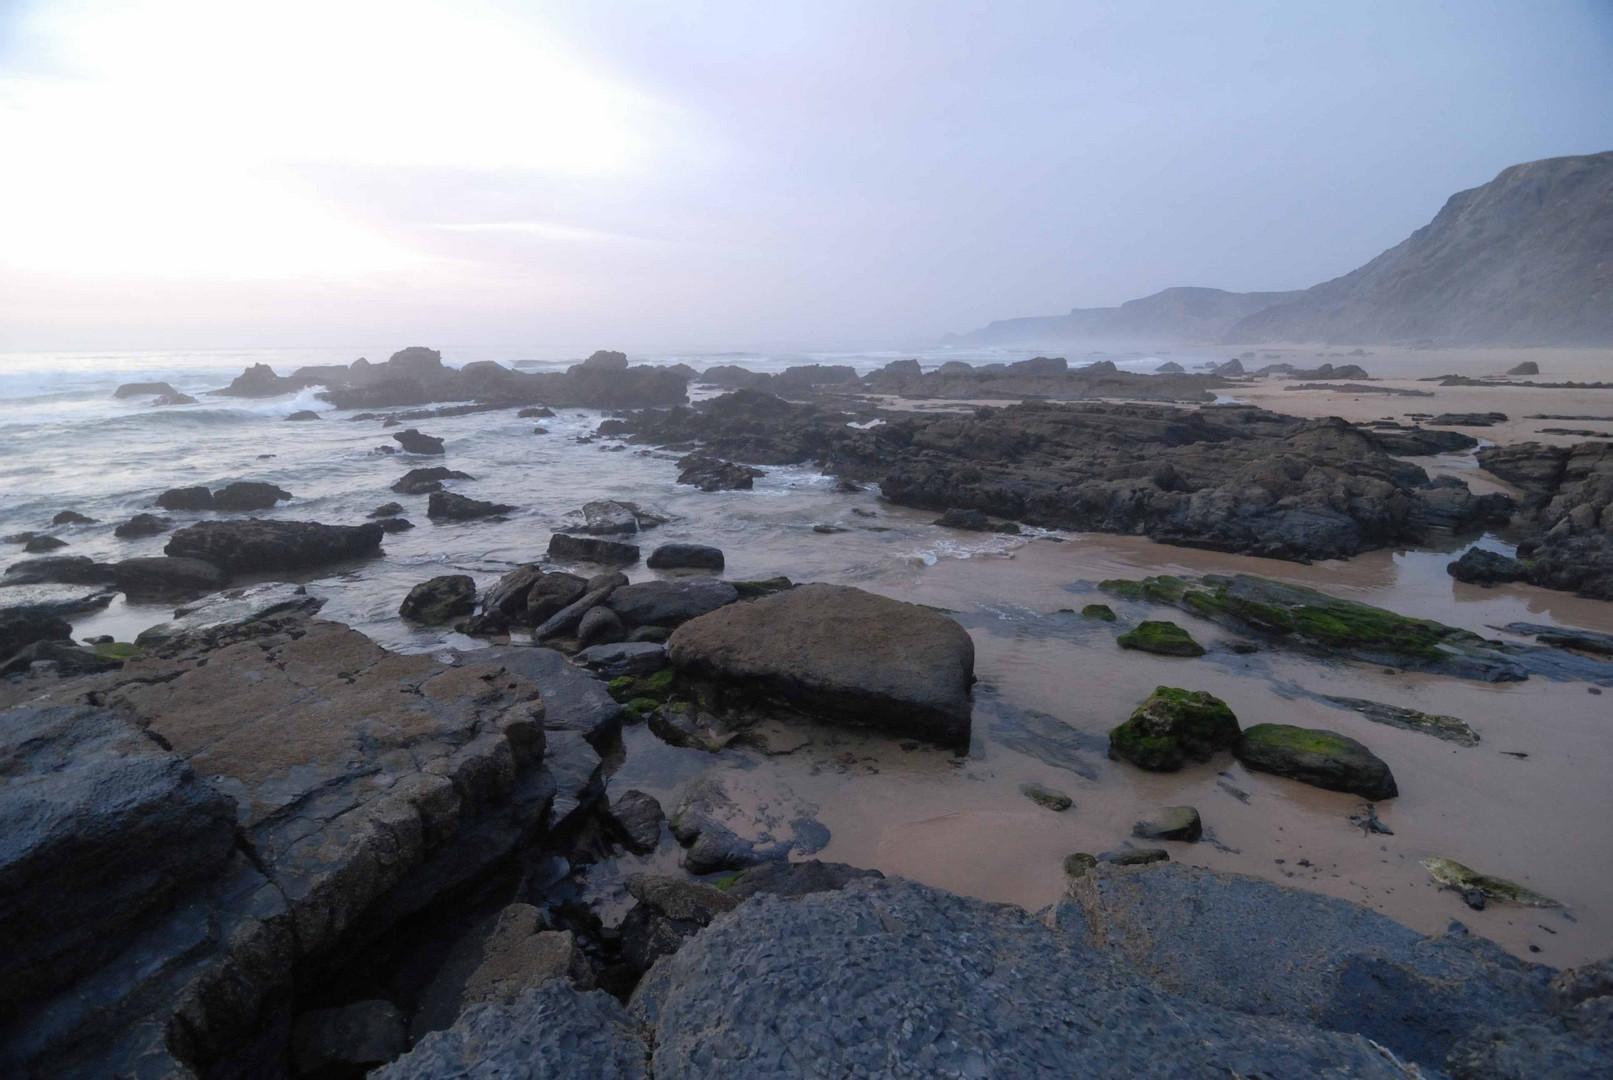 Dunstige Felsen im Wasser